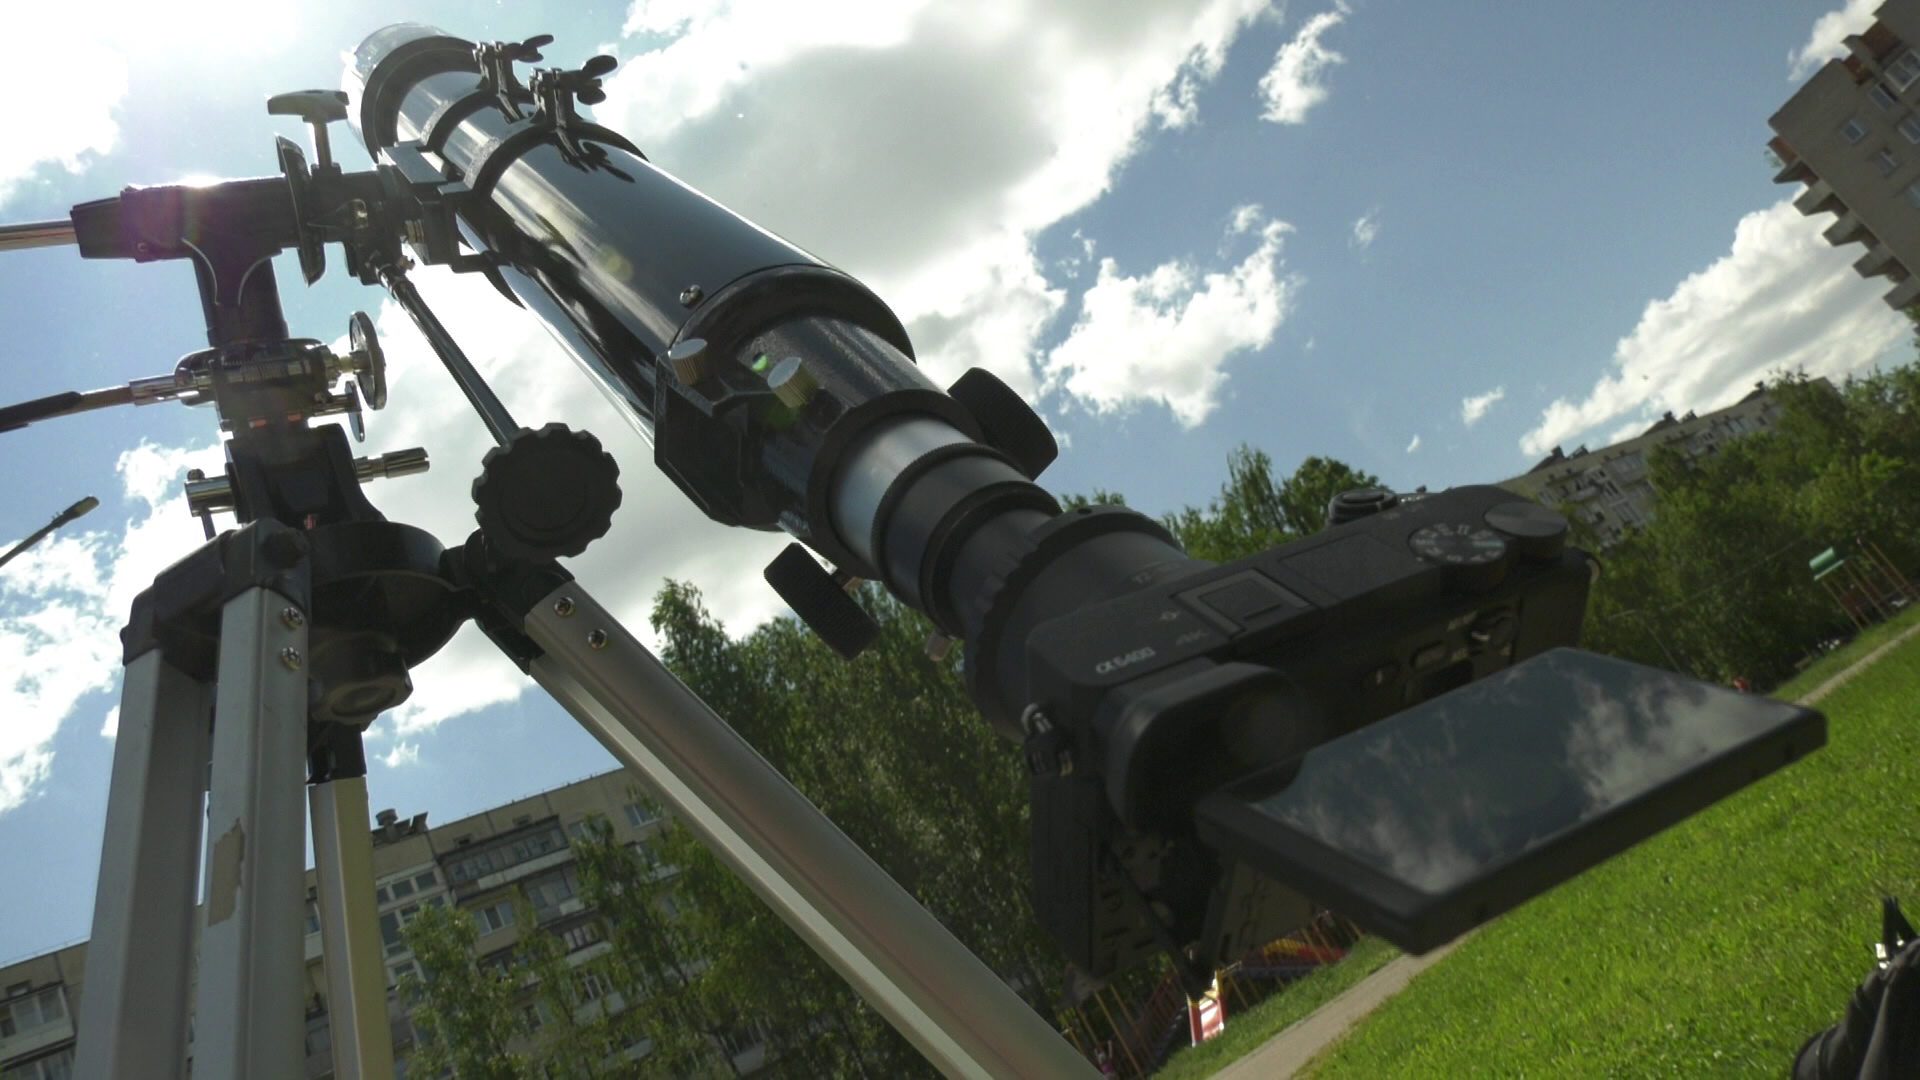 teleskop - В Витебске наблюдали за солнечным затмением (видео)